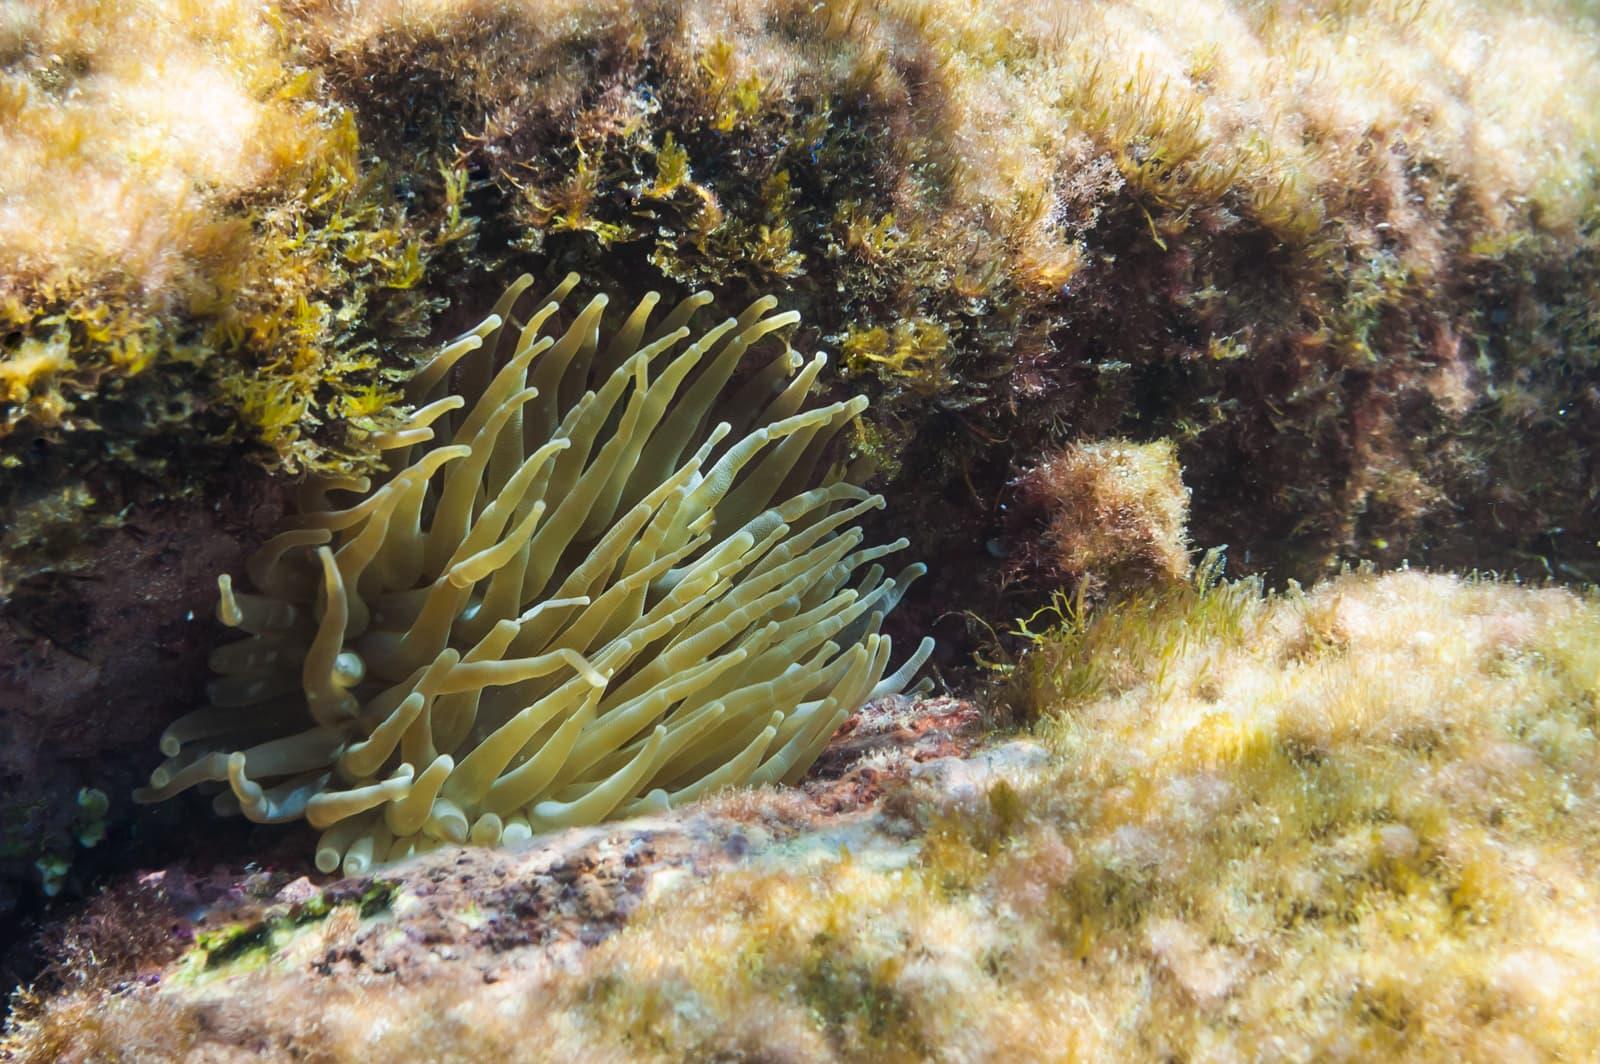 Giant Caribbean Sea Anemone (Condylactis gigantea)